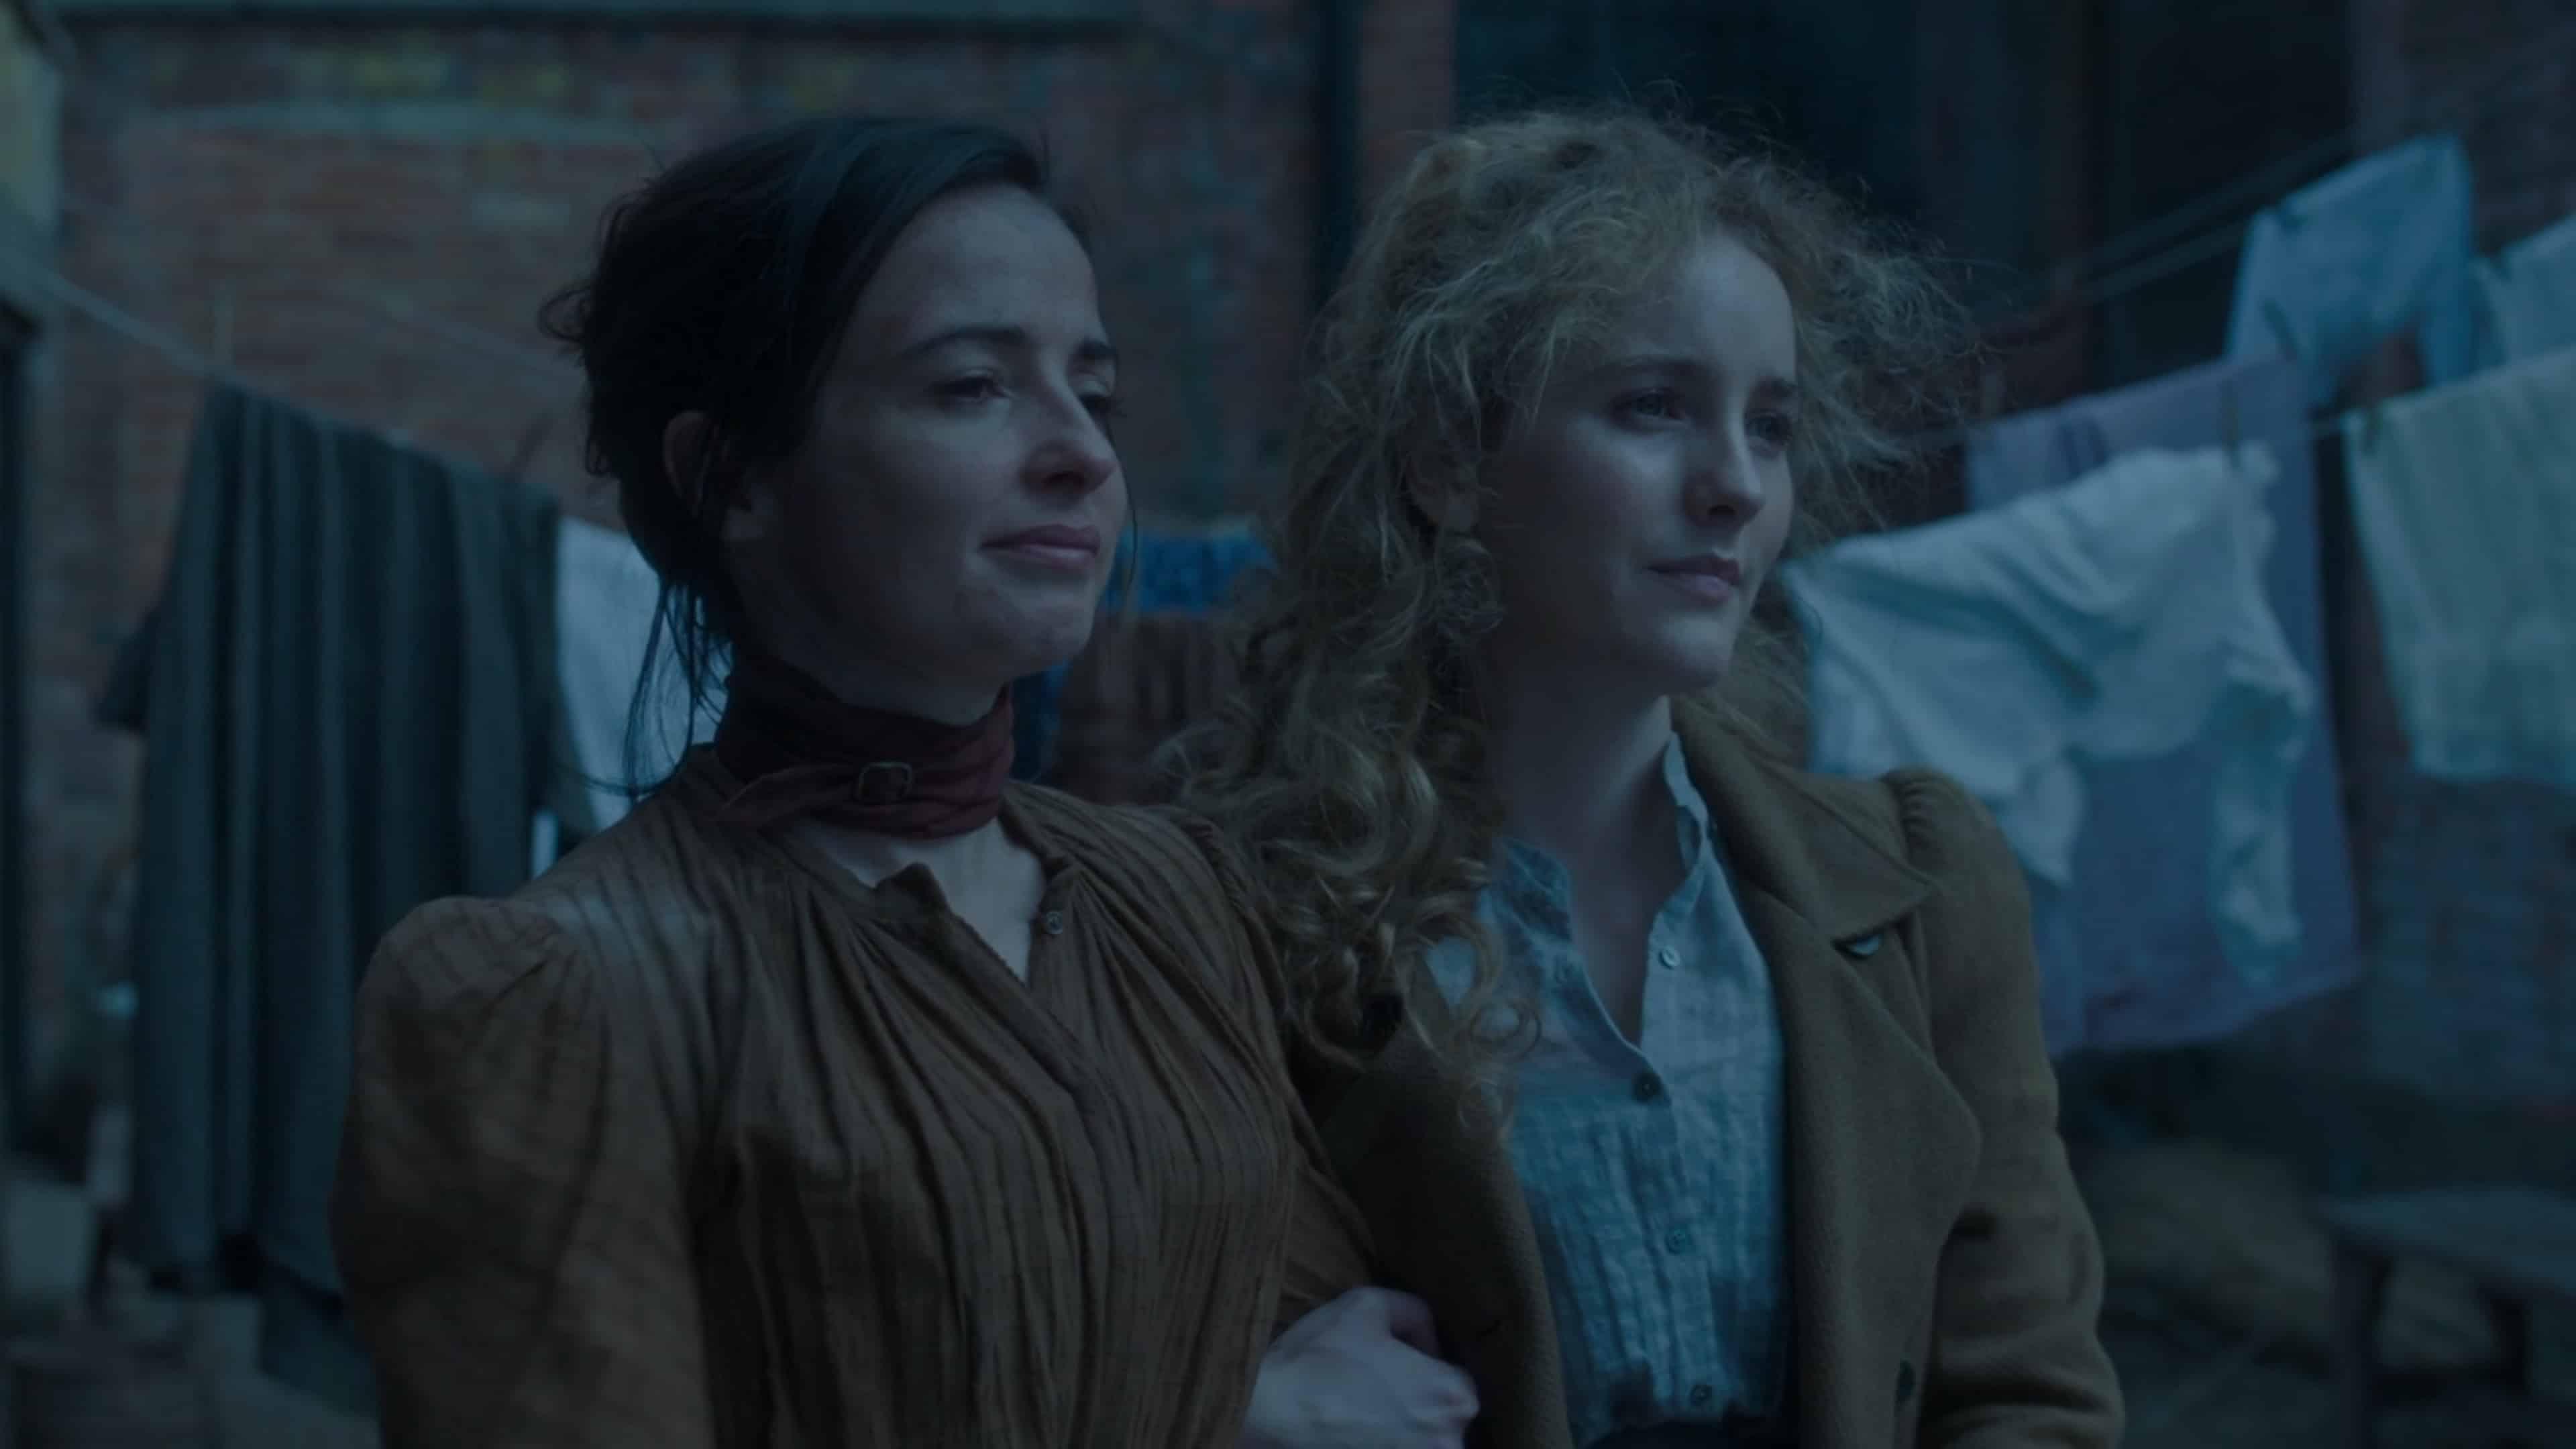 Amalia and Penance arm and arm